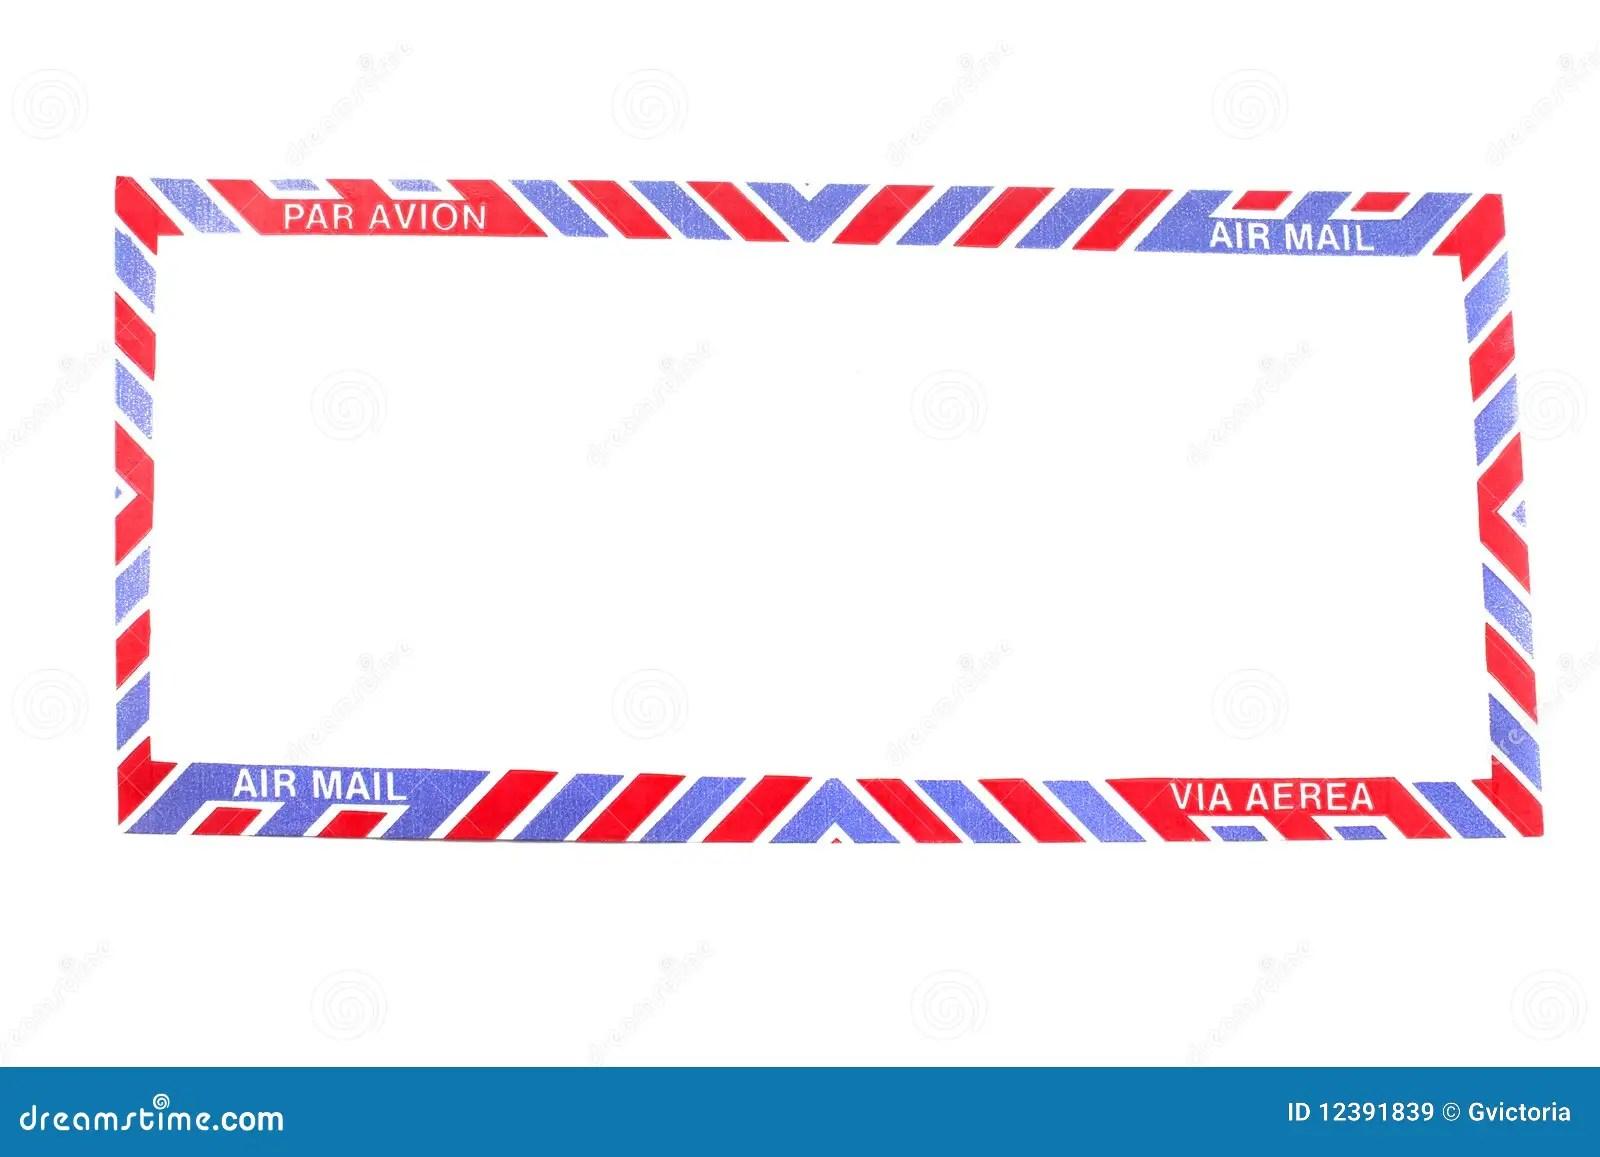 Air Mail Envelope Border Royalty Free Stock Images Image